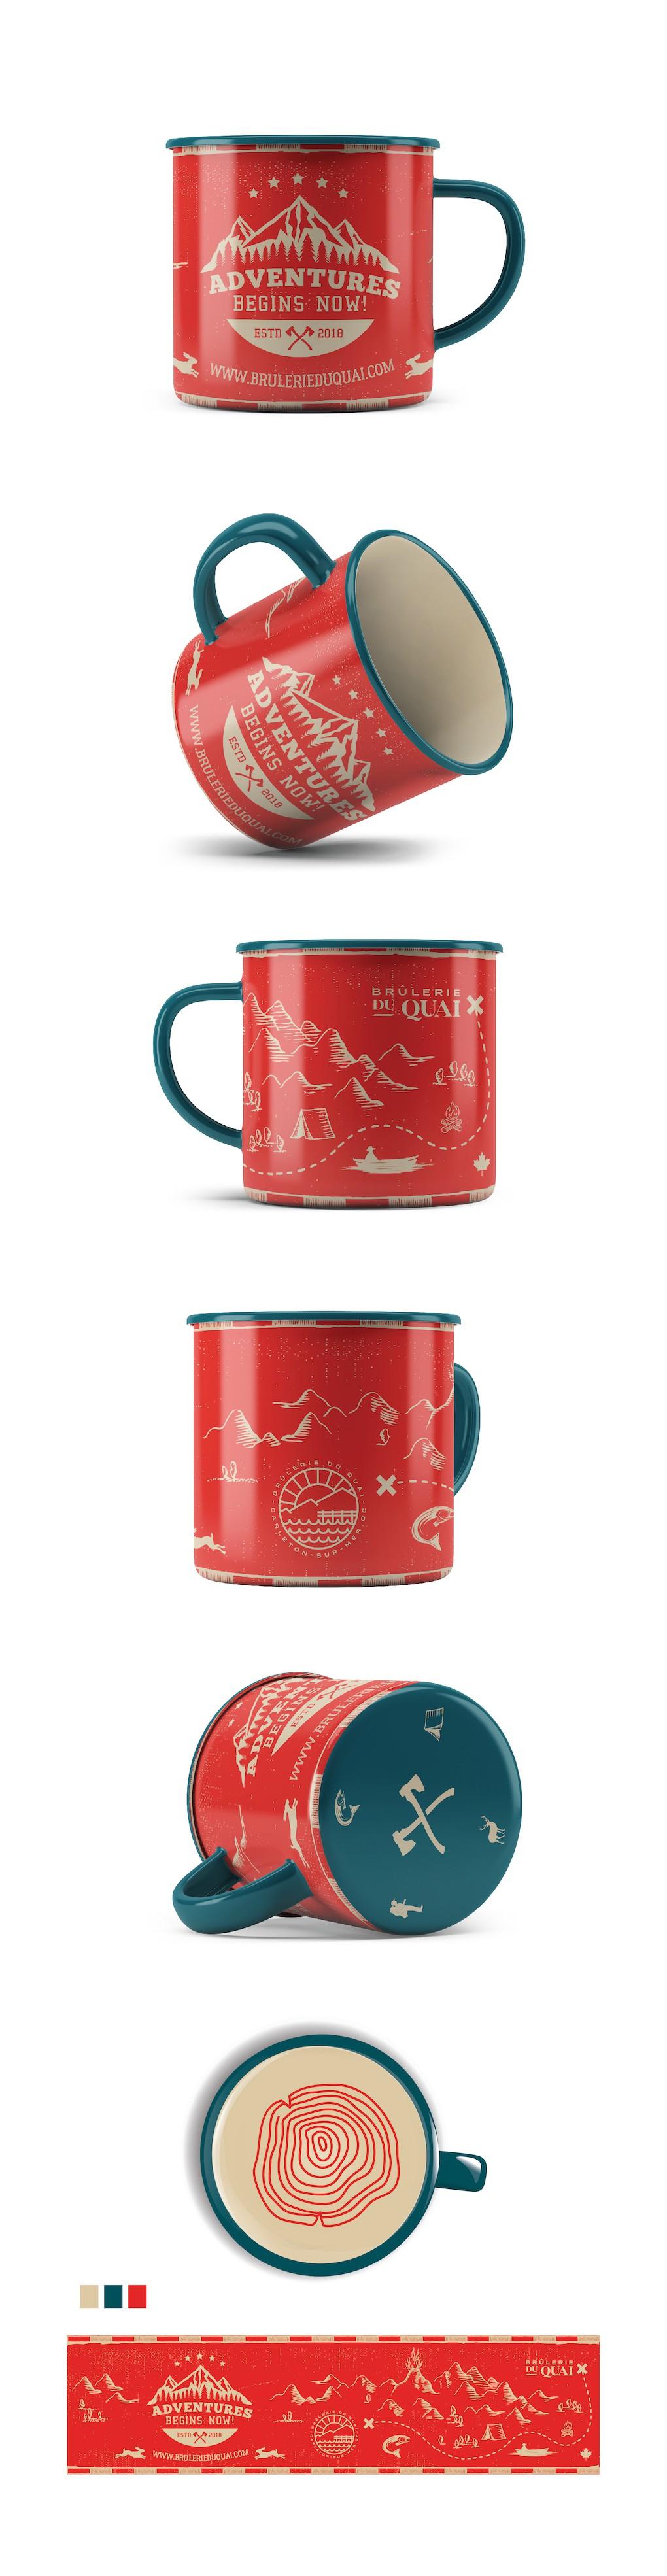 Design my coffee mug for my next camping / flyfishing trip